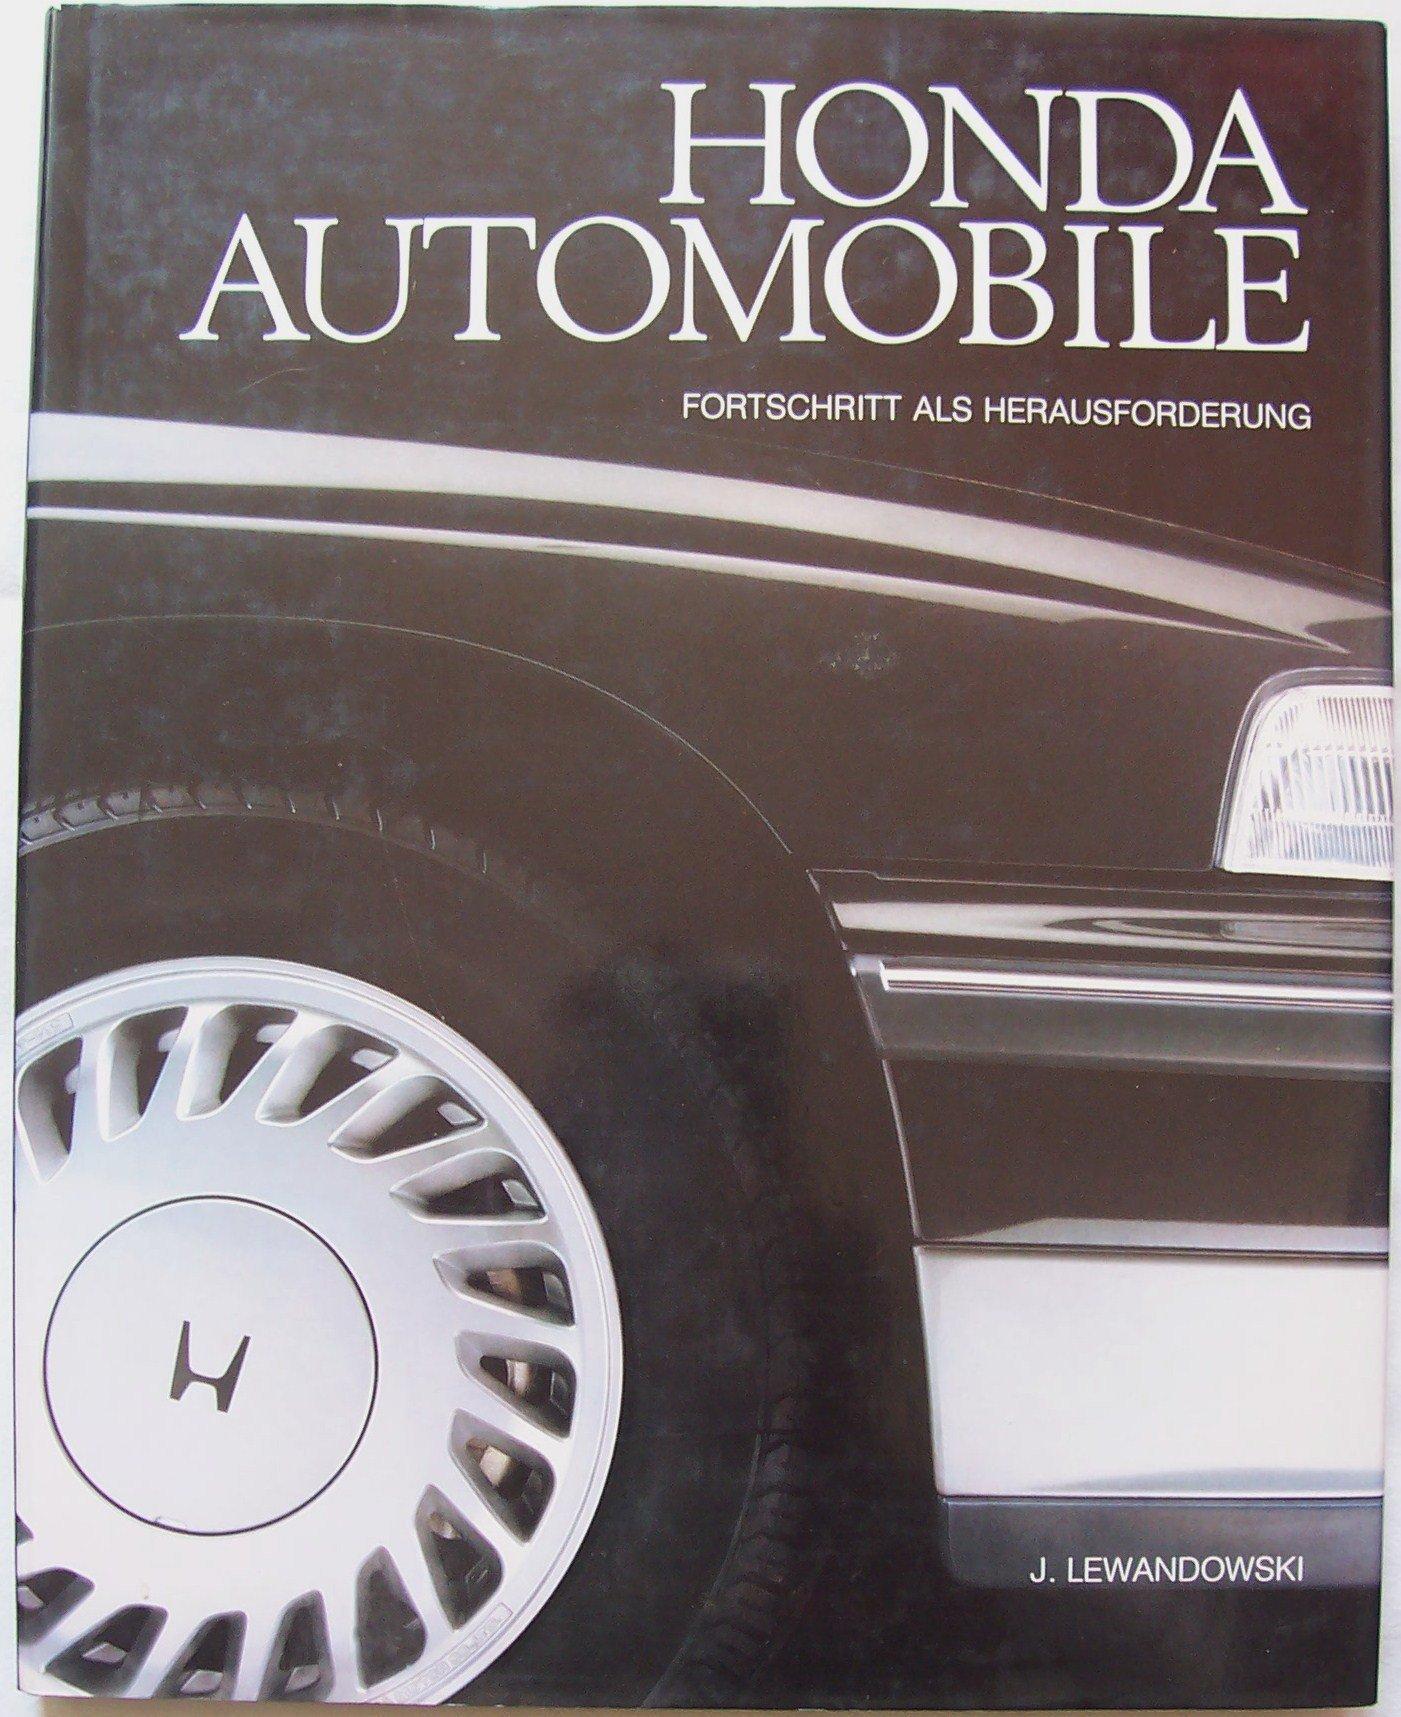 Honda - Automobile. Fortschritt als Herausforderung